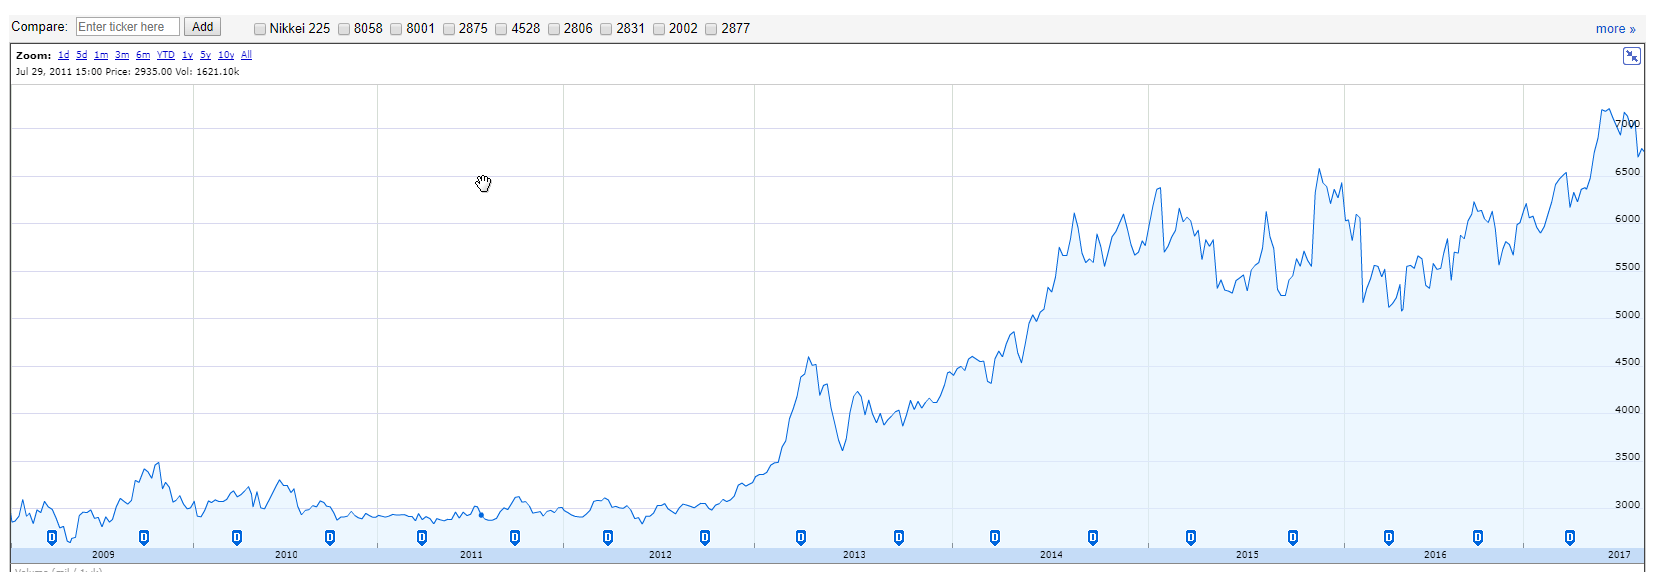 Nissin Stock Chart